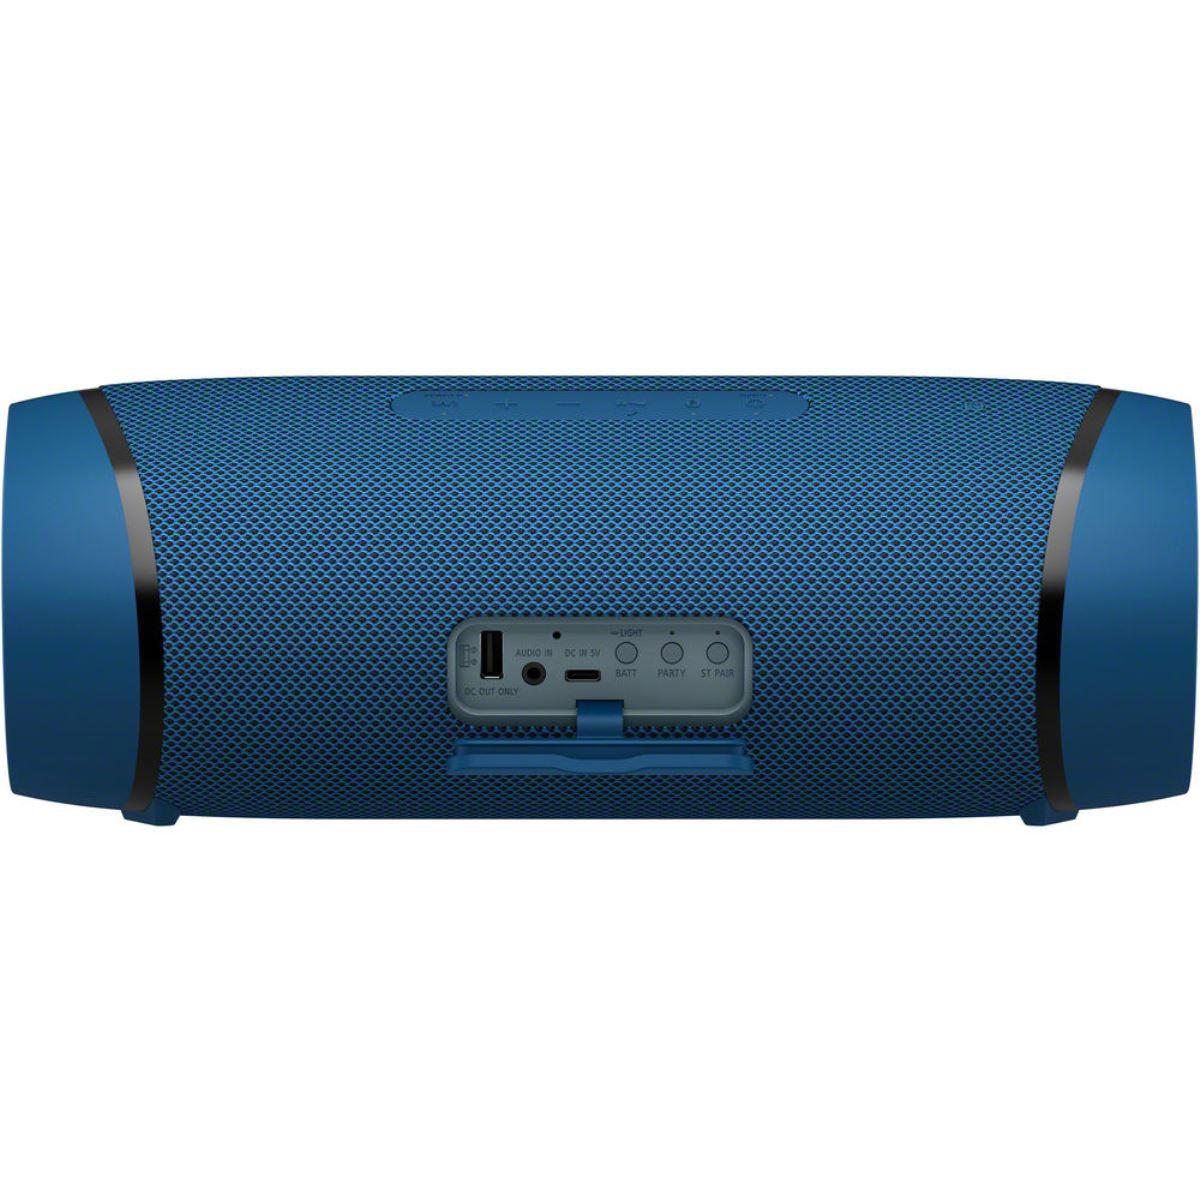 Bocina Portátil Sony EXTRA BASS XB43 Azul